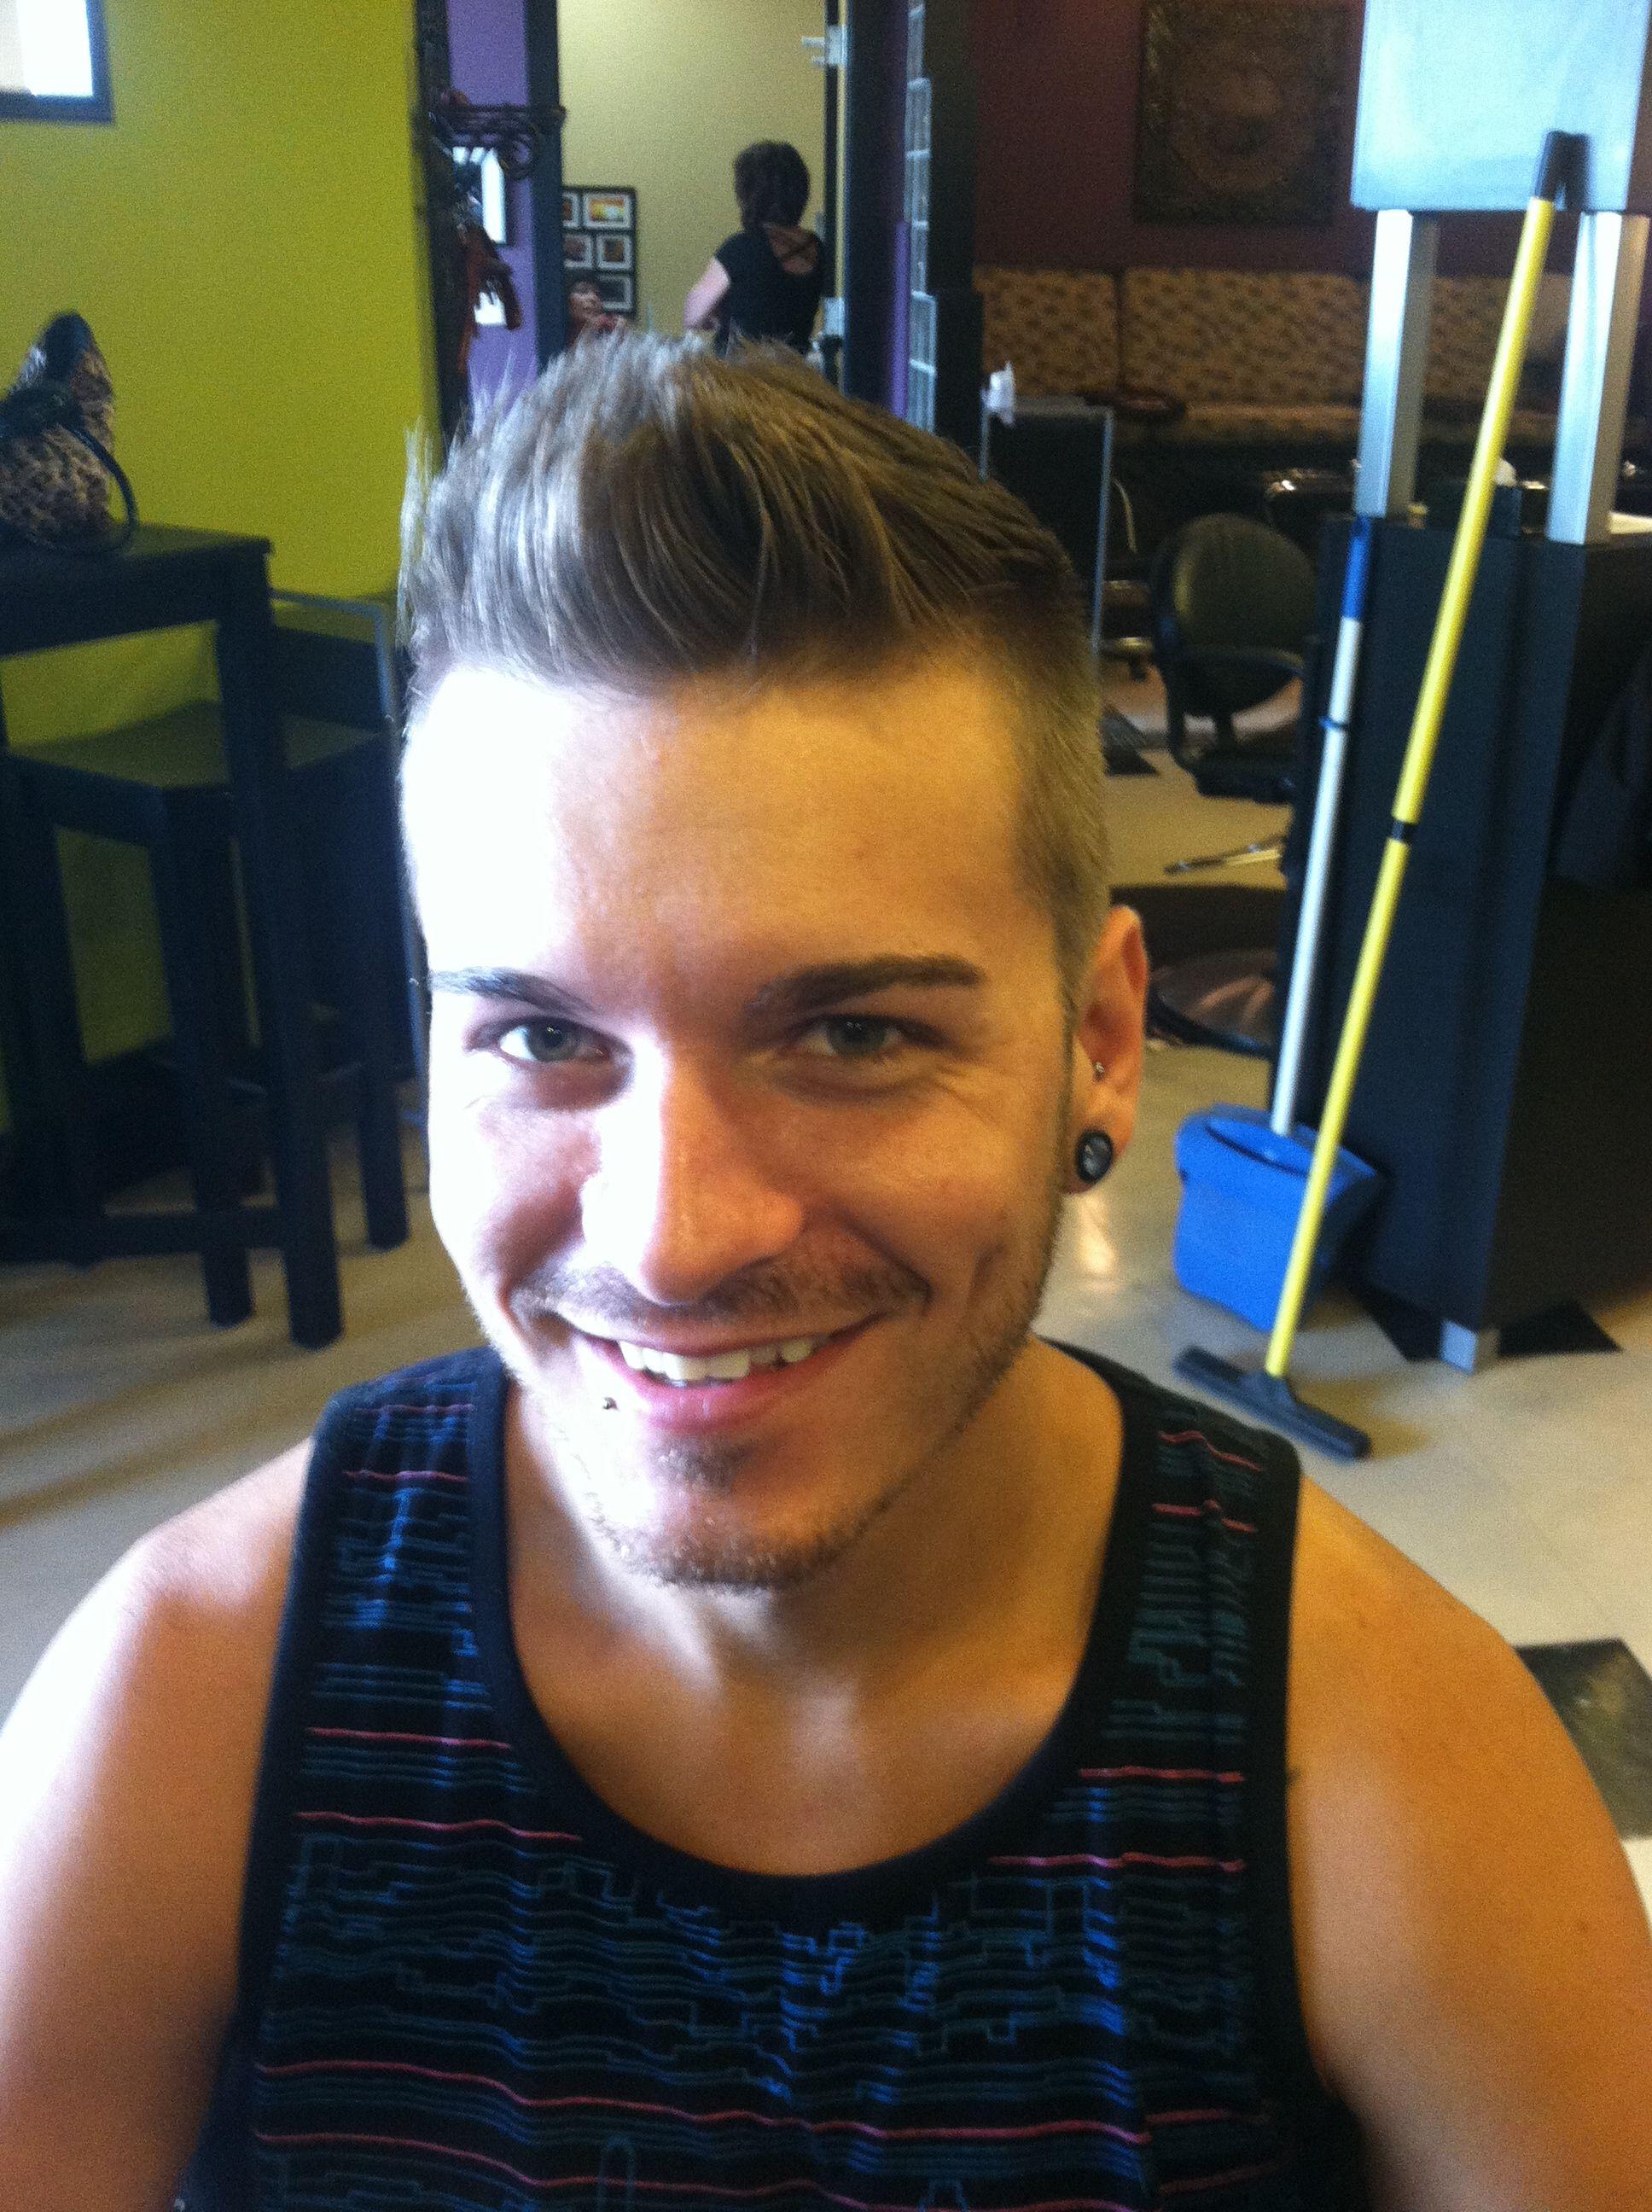 Mens Haircut By Caitlin Kelly Avantgarde Salon And Spa Grand